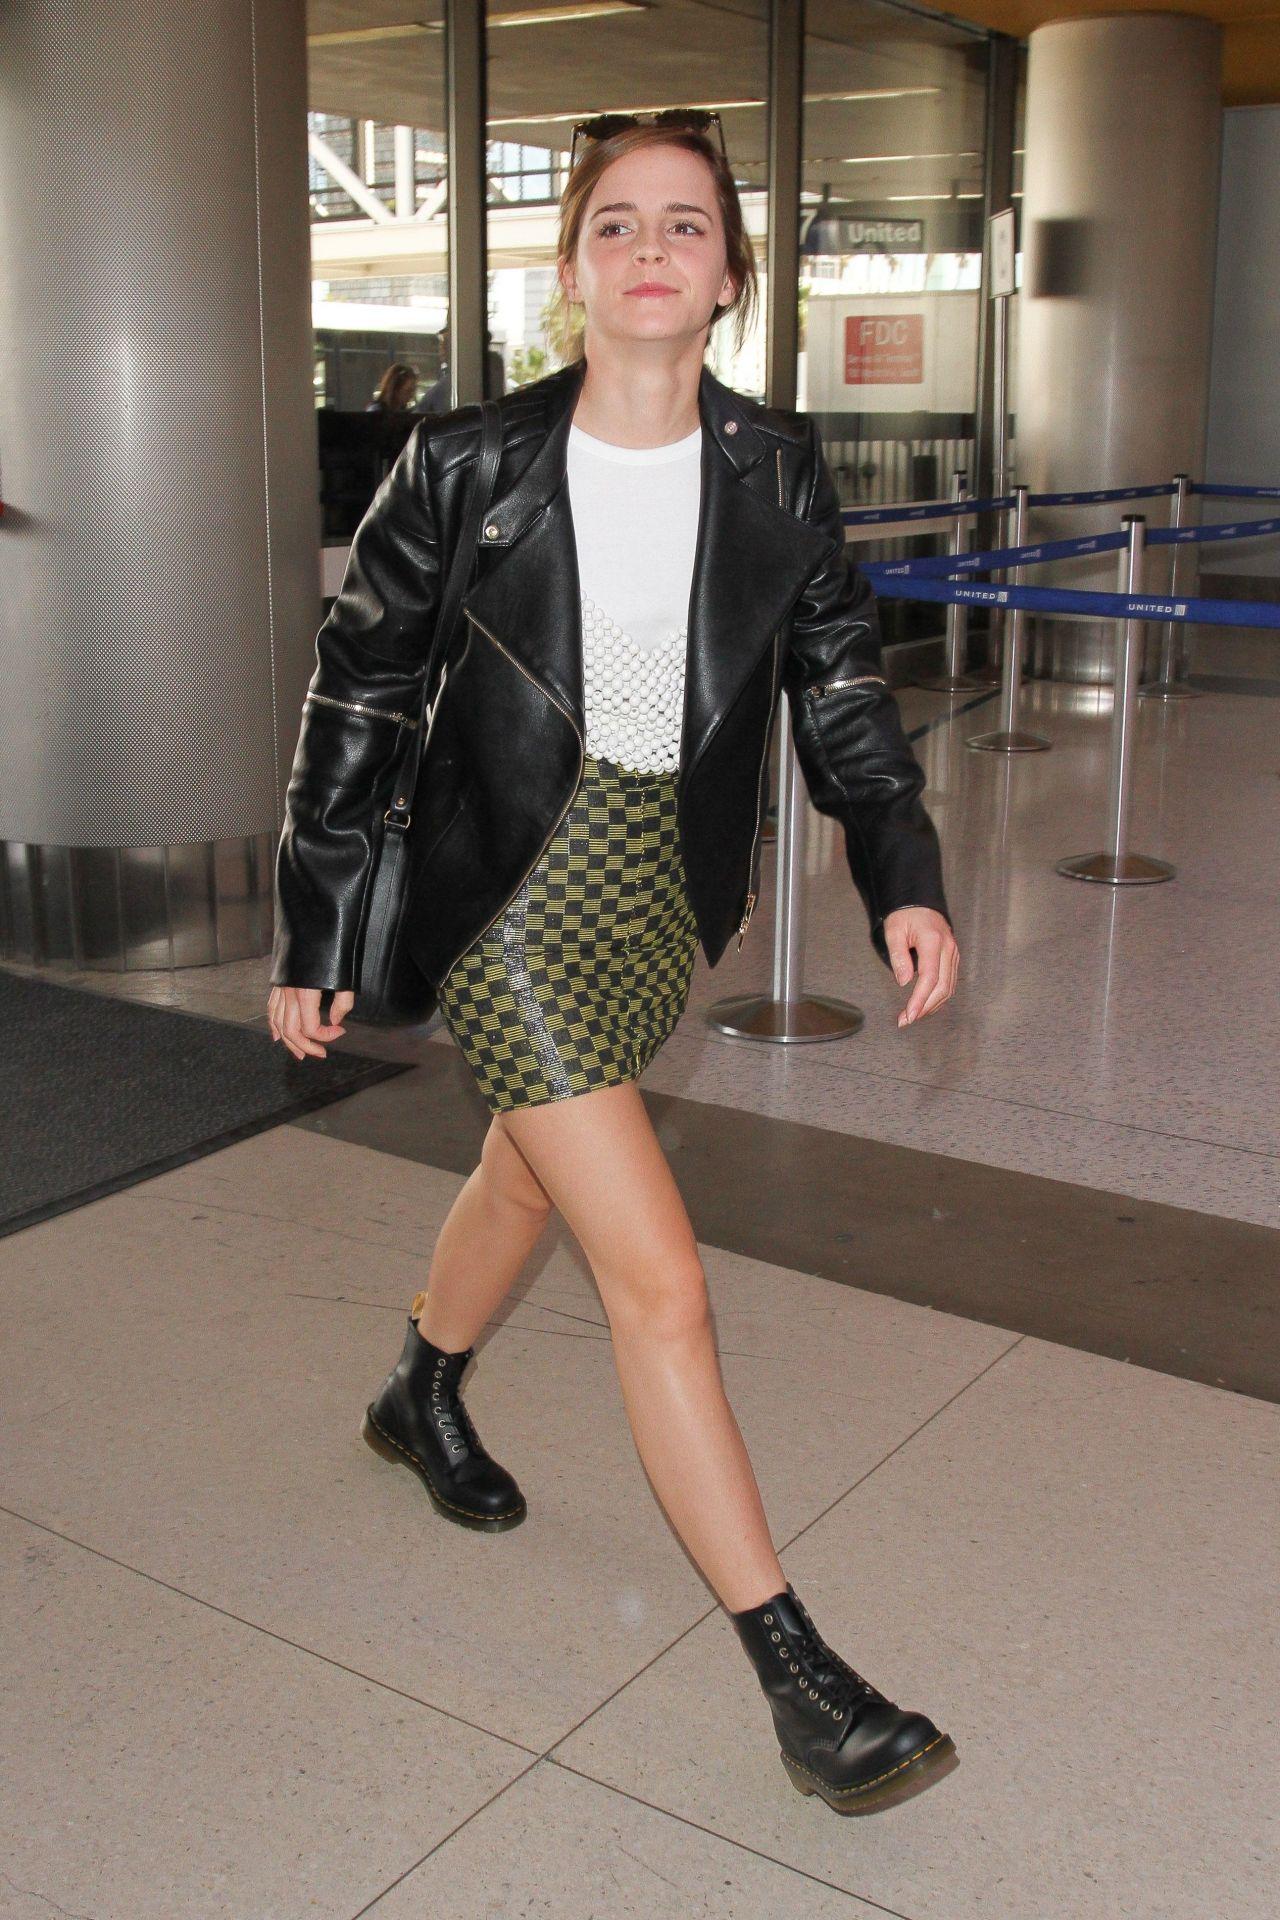 emma-watson-leggy-in-mini-skirt-arrives-at-los-angeles-international-airport-3-7-2017-6.jpg (1280×1920)